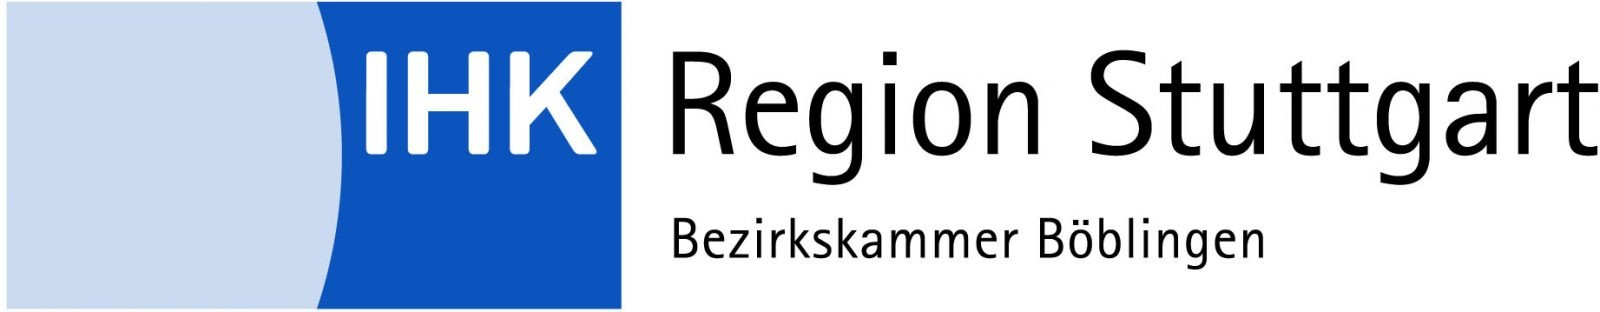 IHK_BK_Boeblingen